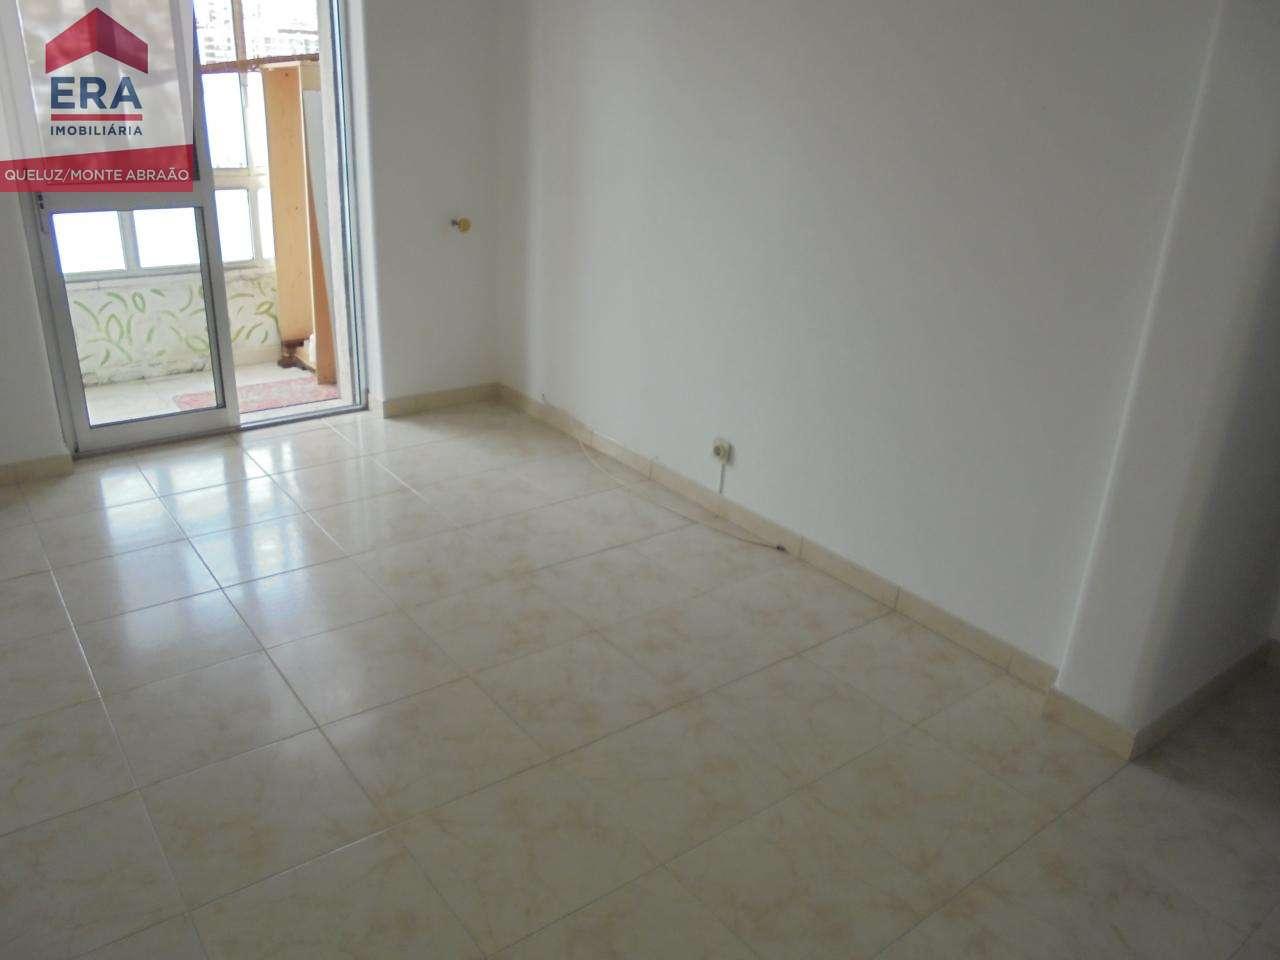 Apartamento para comprar, Queluz e Belas, Sintra, Lisboa - Foto 4